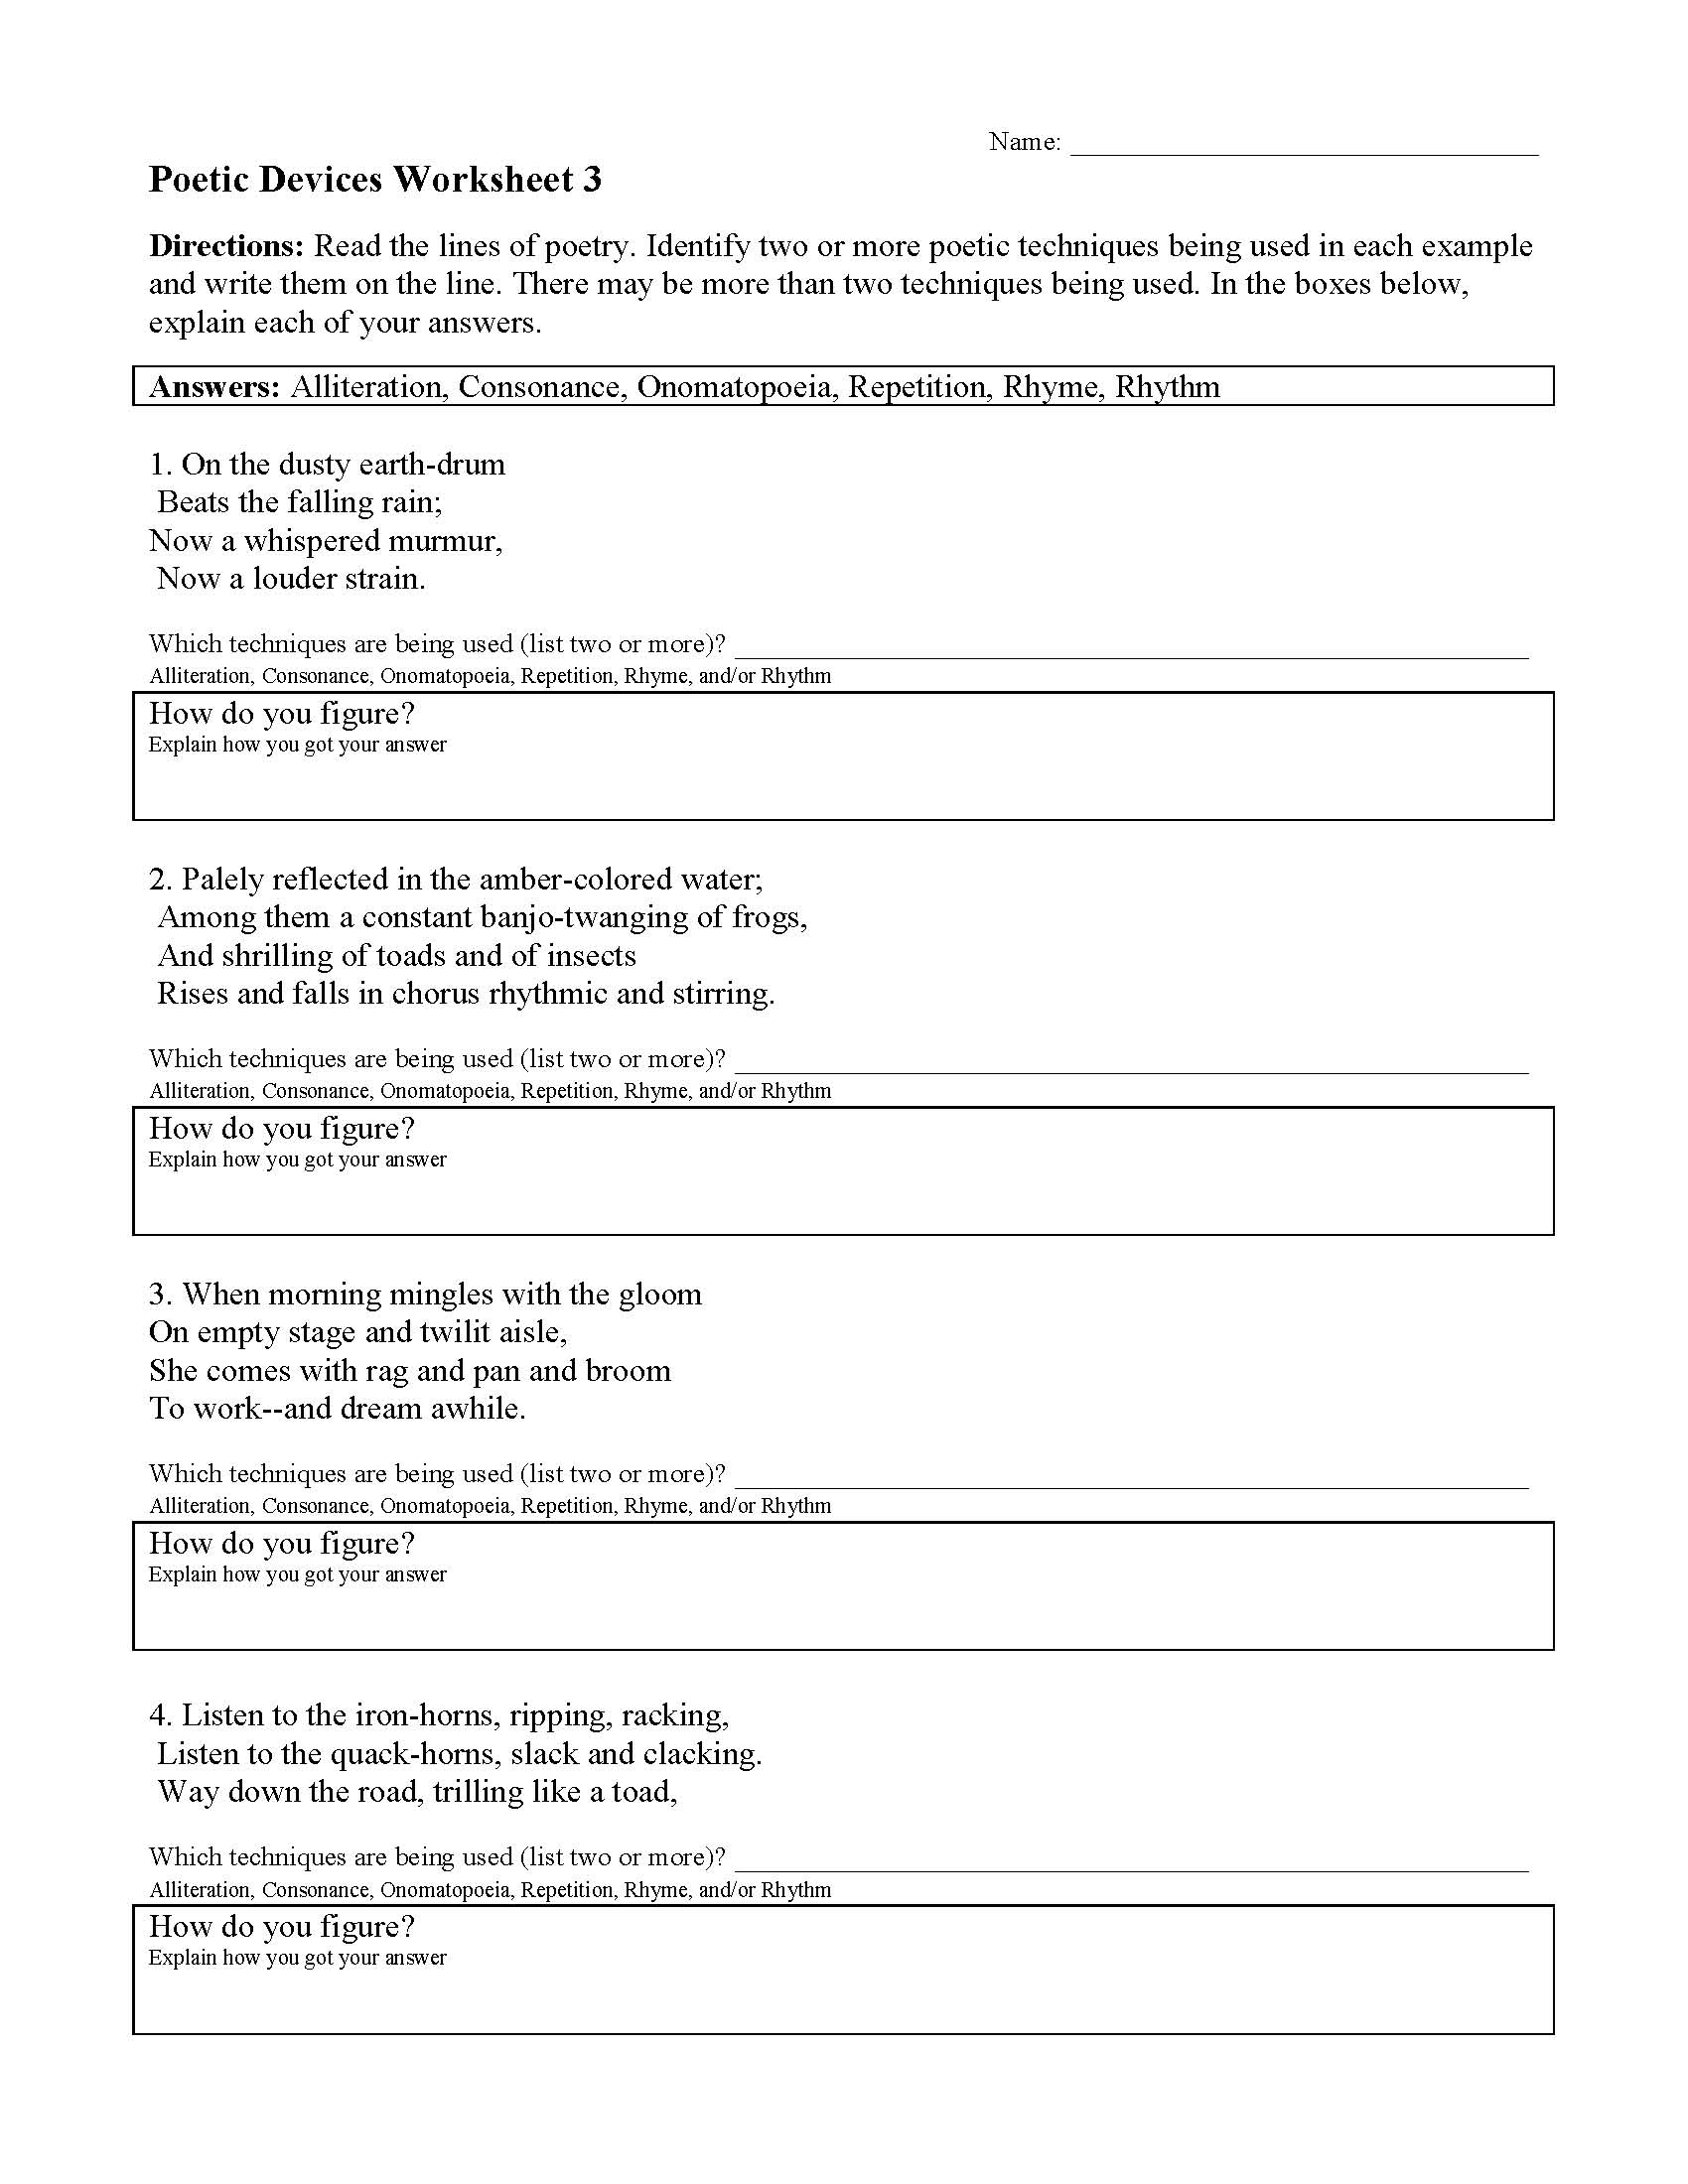 Poetic Devices Worksheet 3